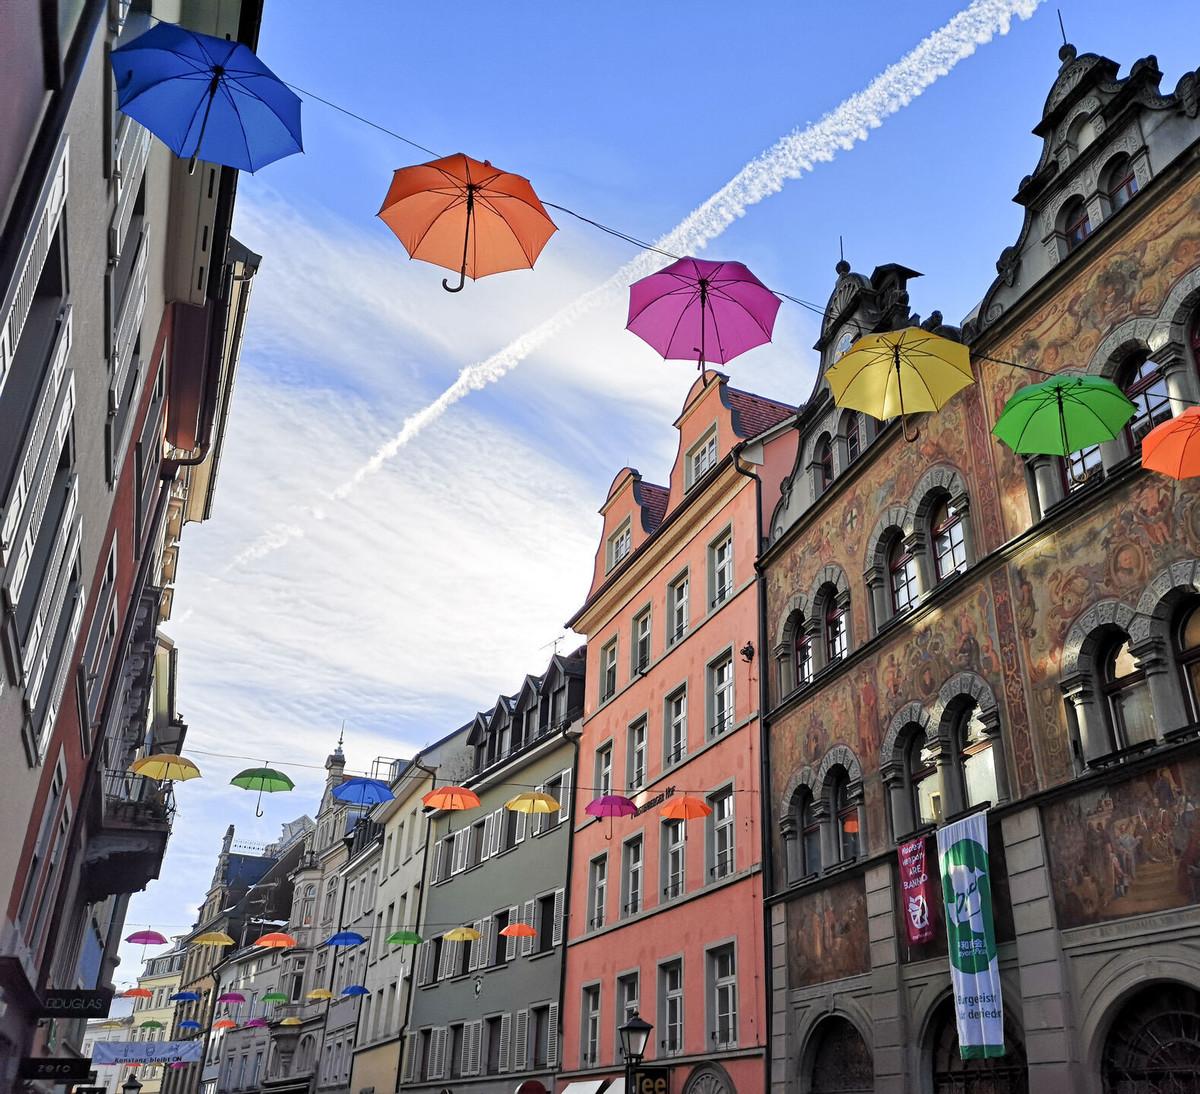 Konstanz-Farbtupfer-der-Hoffnung-02_Winter_Copyright_MTK-Anja-Schnuch